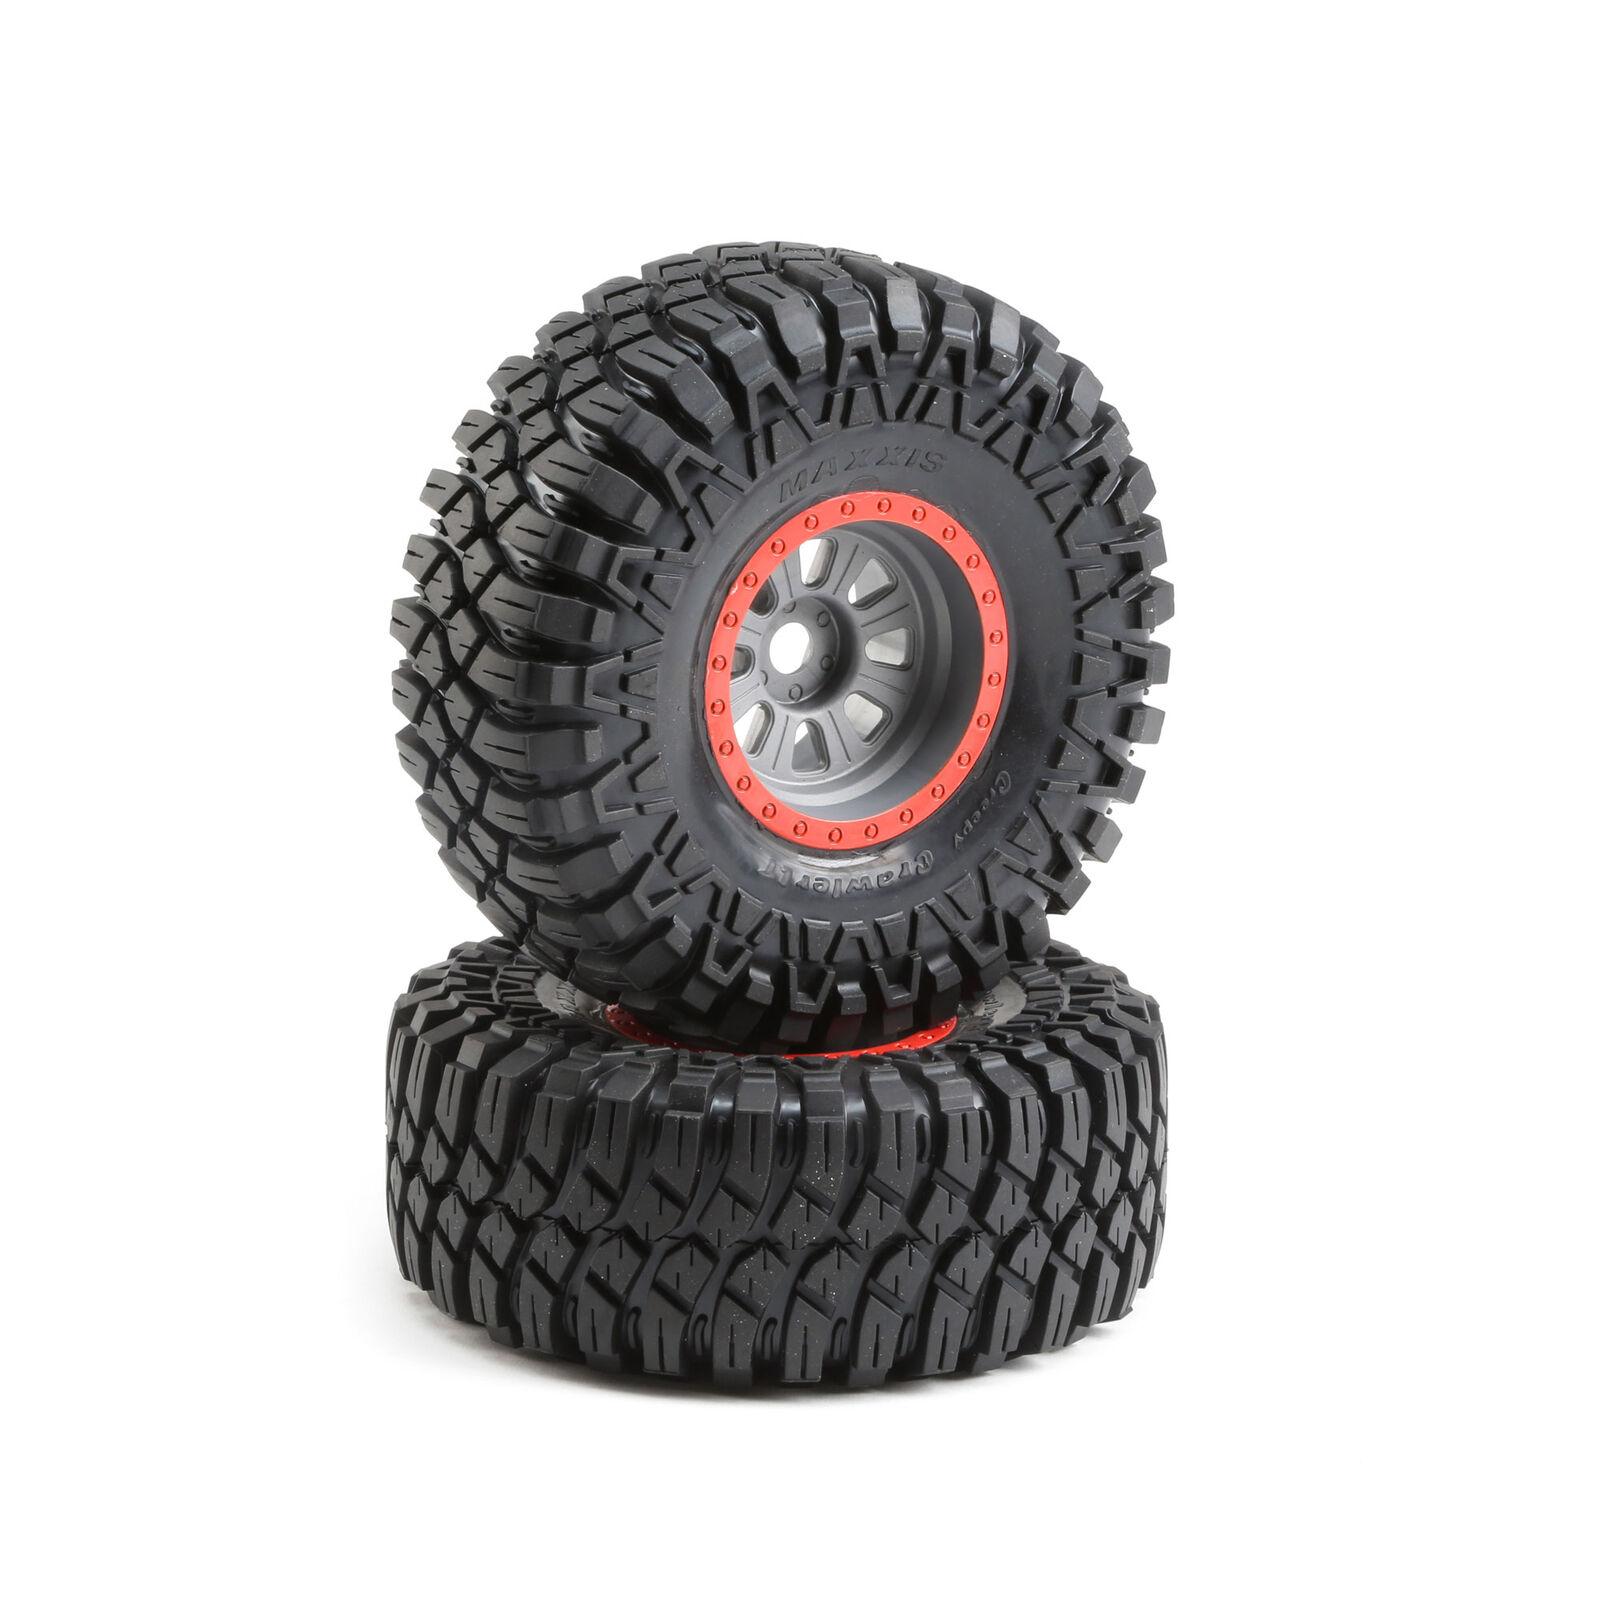 1/6 Maxxis Creepy Crawler LT Front/Rear  3.6 Pre-Mounted Tires, 20mm Hex (2): Super Rock Rey